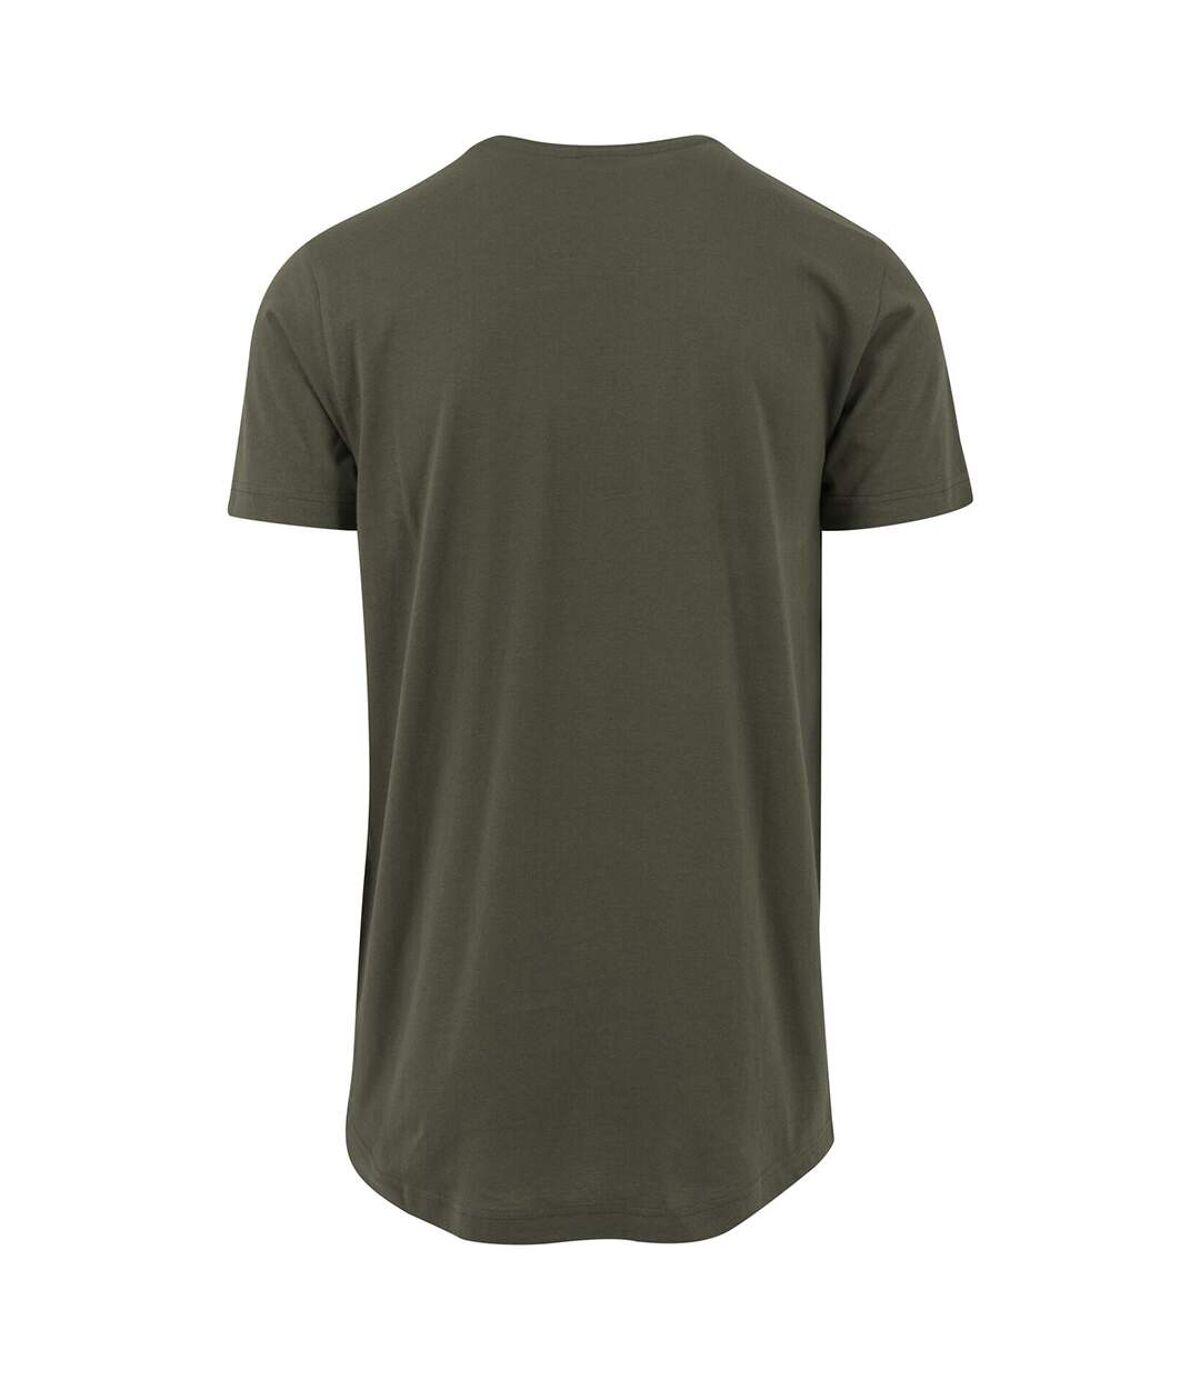 Build Your Brand Mens Shaped Long Short Sleeve T-Shirt (Olive) - UTRW5671